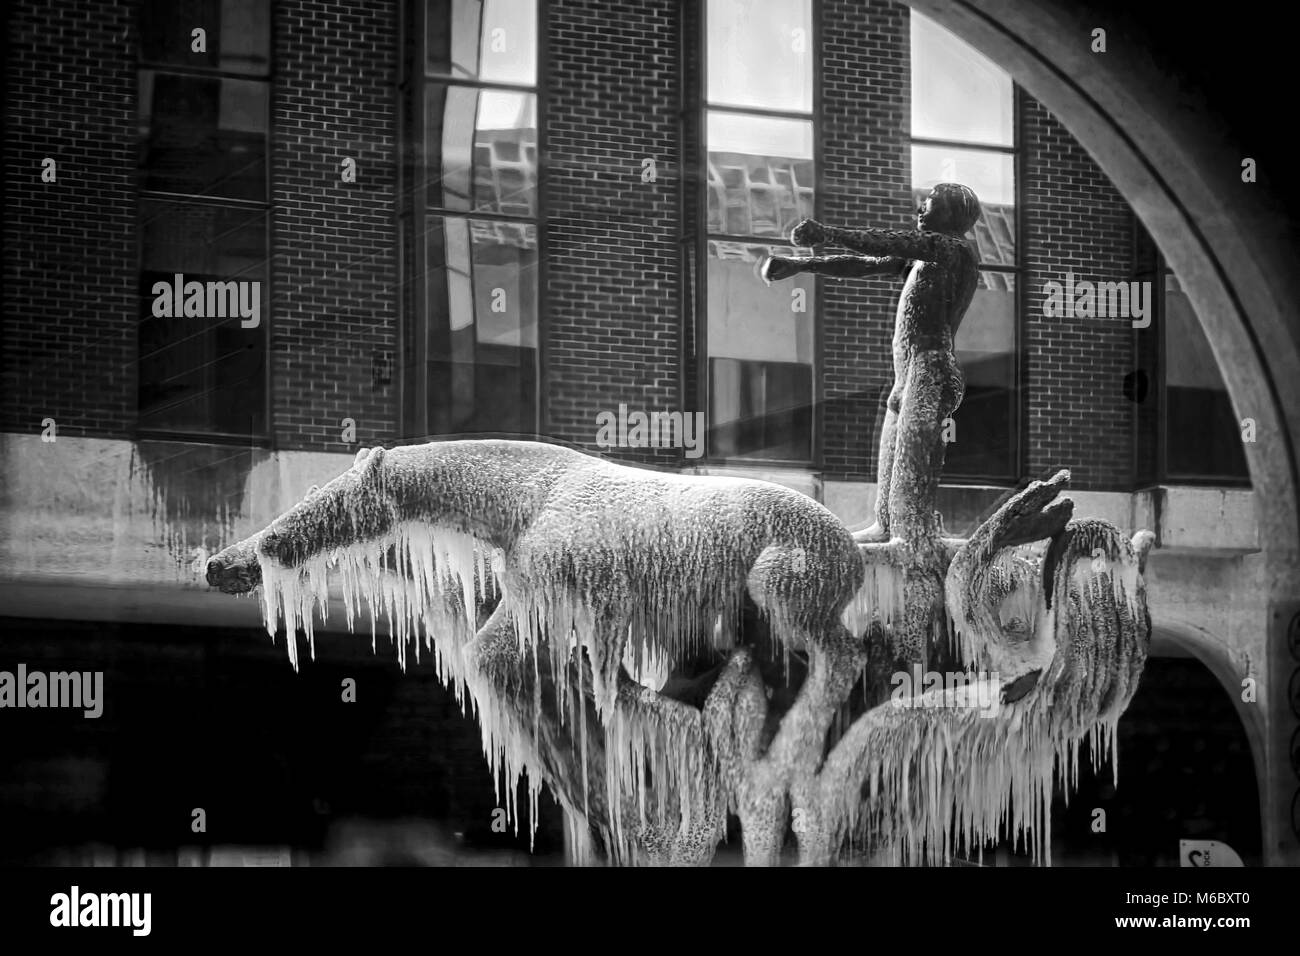 Dublin/Ireland 03/02/2018 Frozen Chariot of life fountain on Abbey Street in front of Irish Life. Storm Emma, Beast - Stock Image